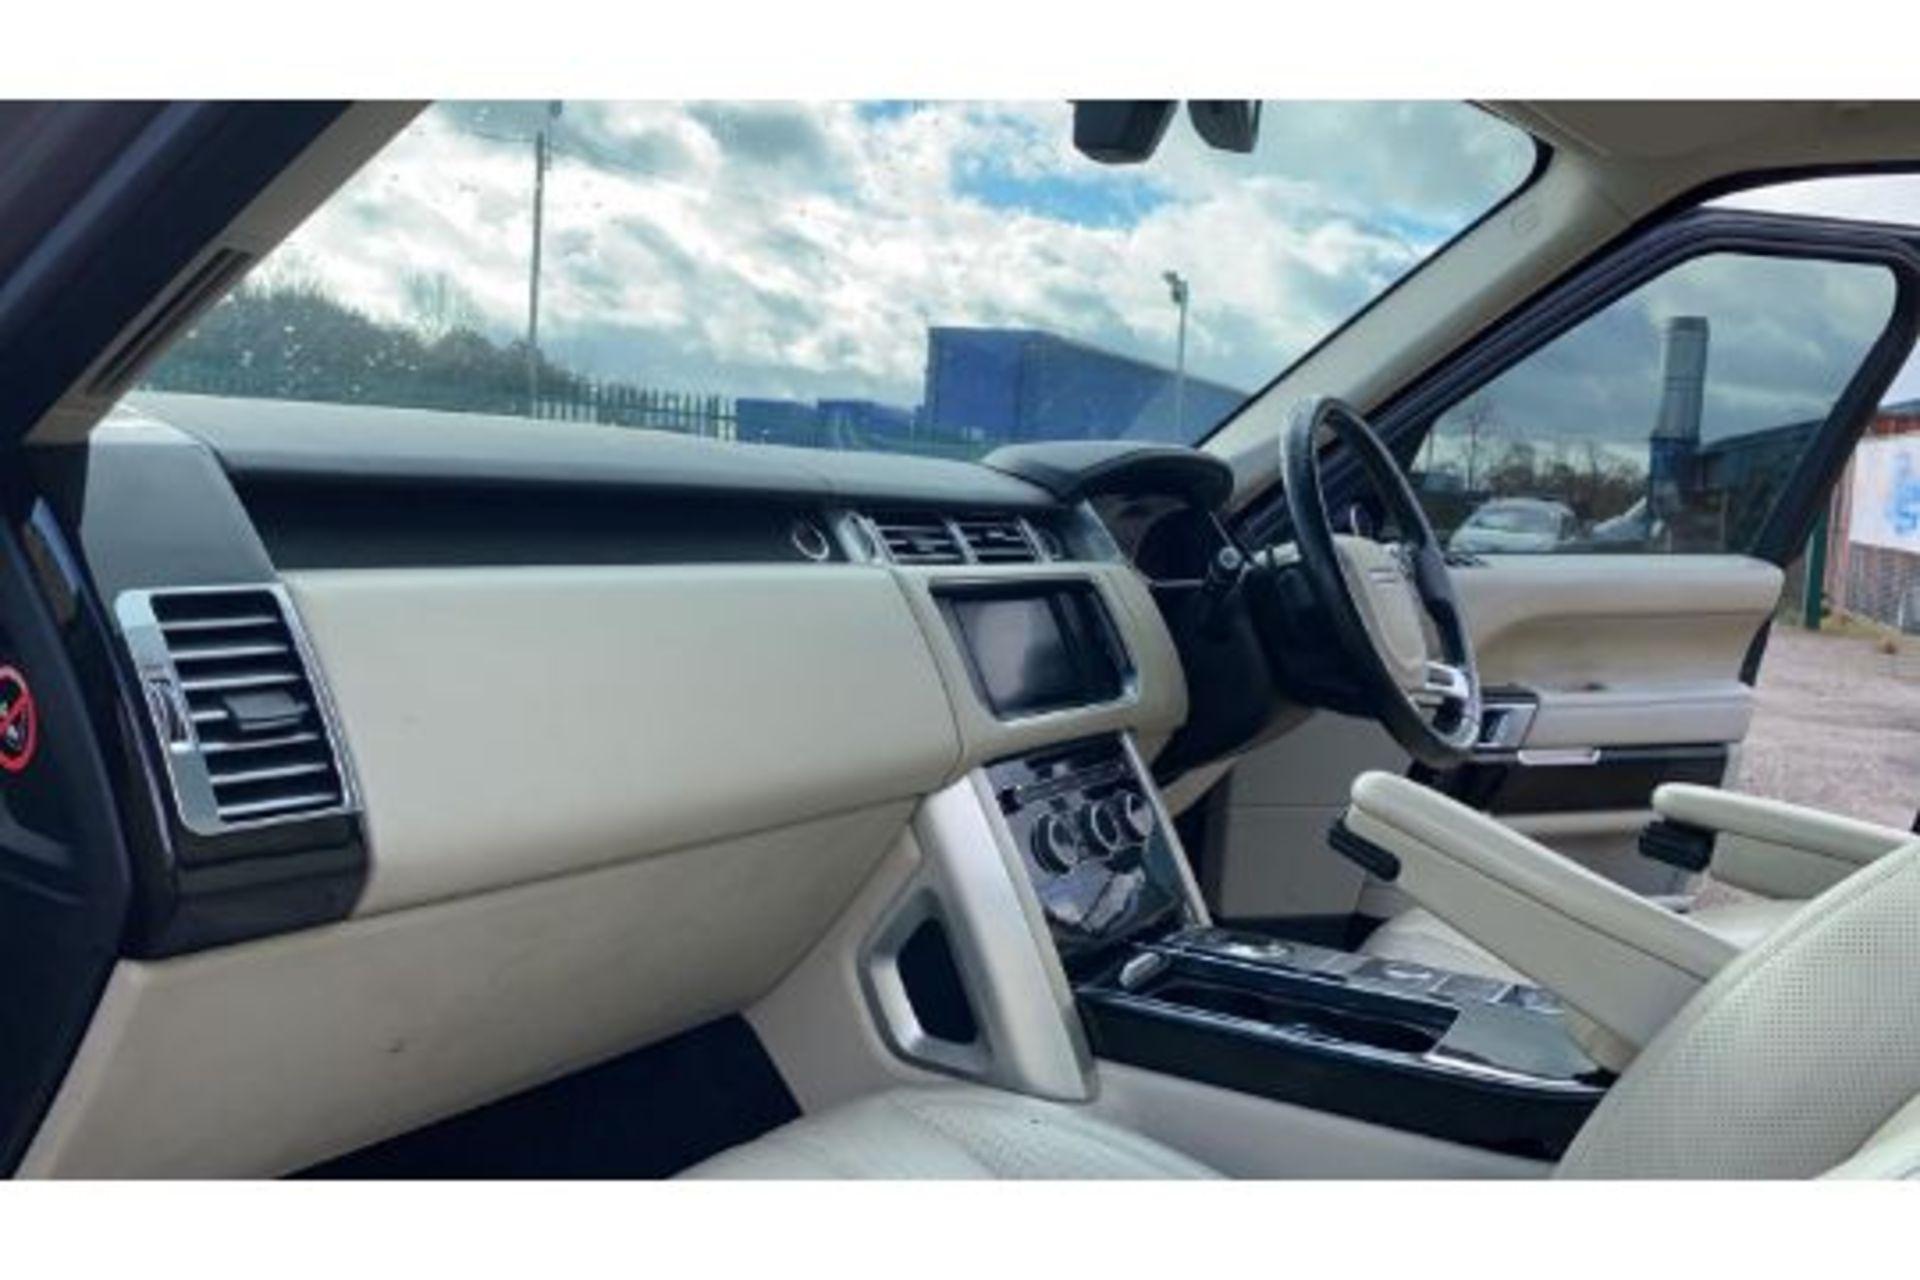 Range Rover Vogue 3.0 TDV6 SE Auto - Black Pack - NEW SHAPE - FULLY LOADED - Pan Roof - Image 11 of 30